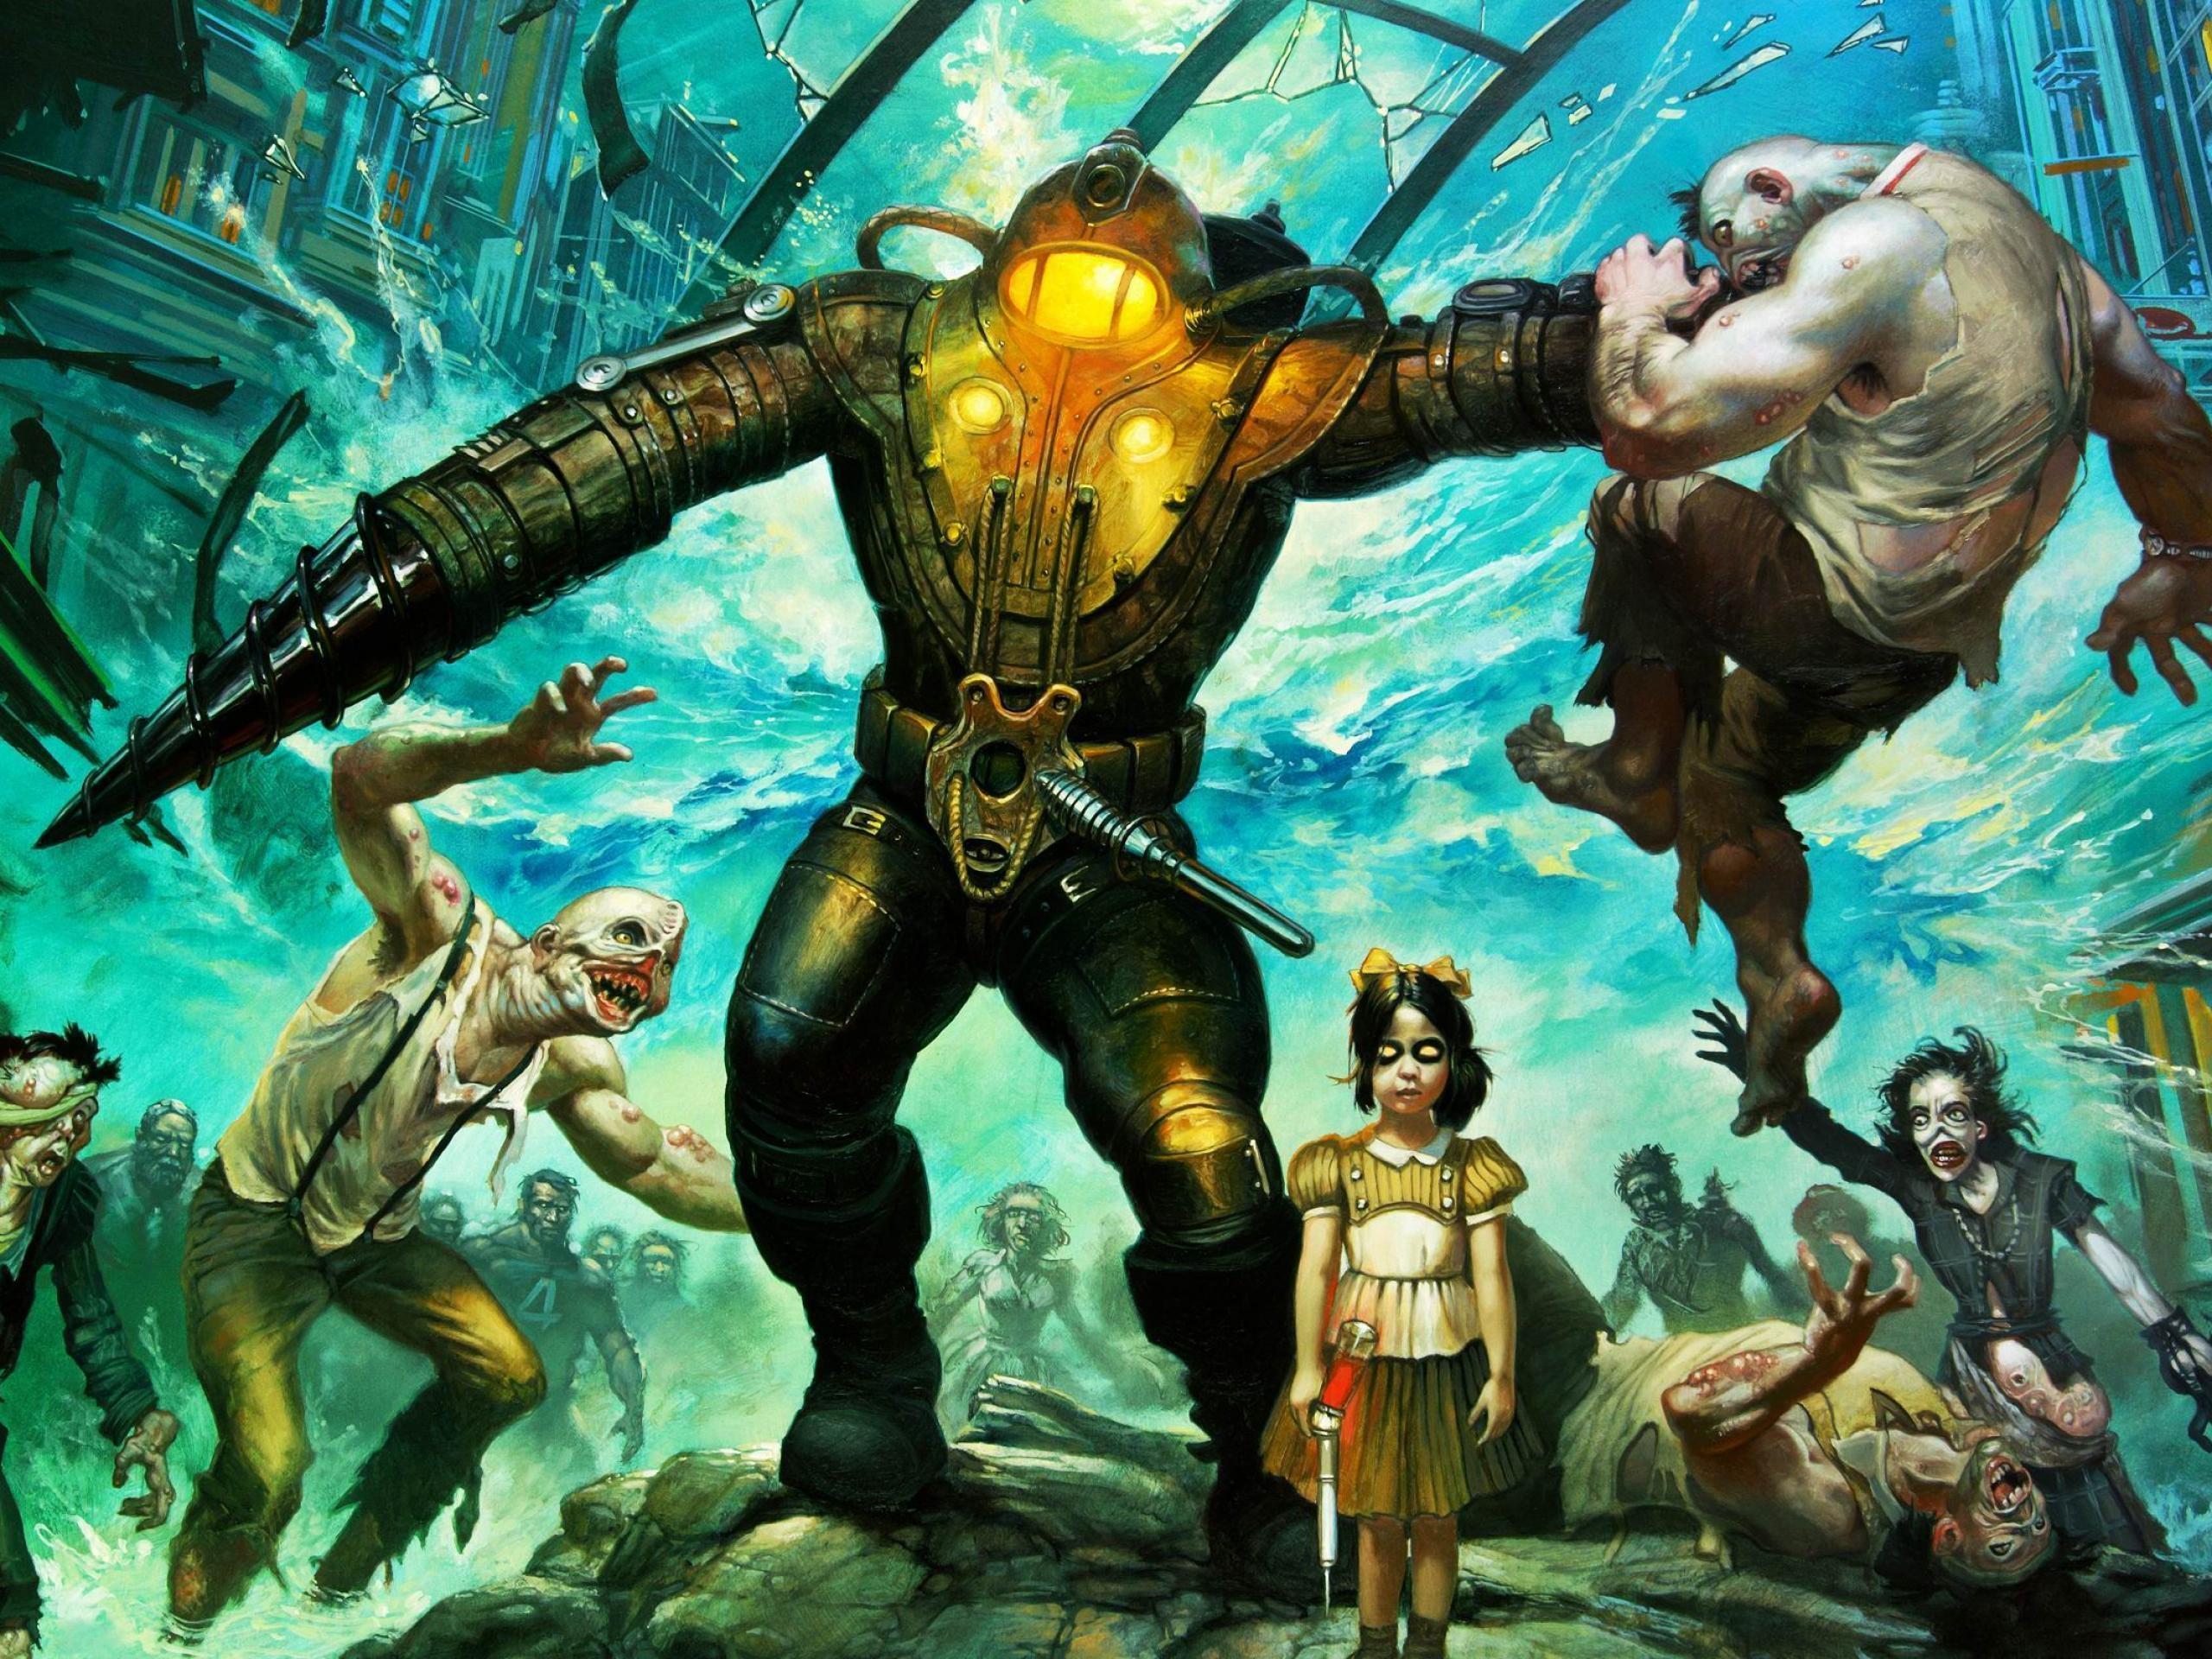 Bioshock Big Daddy Little Sister Wallpaper Hd Games 4k